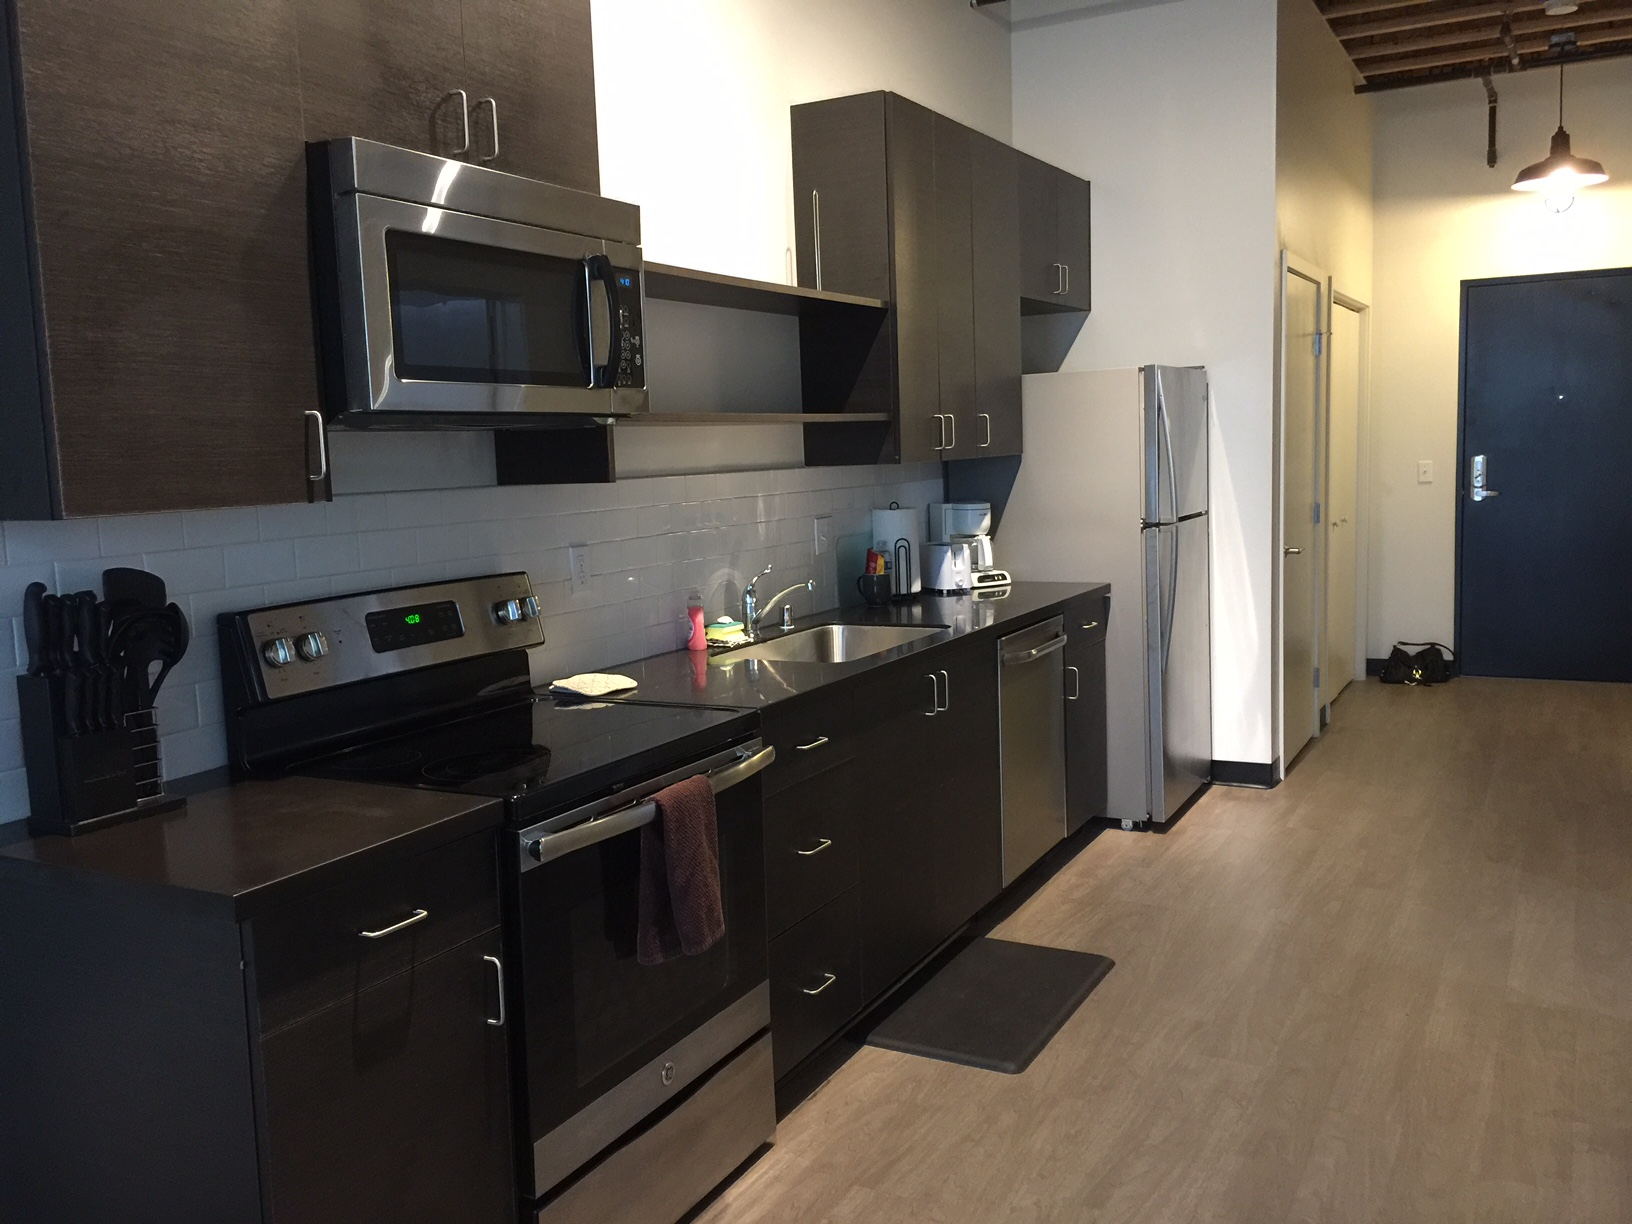 chung 2 kitchen.JPG